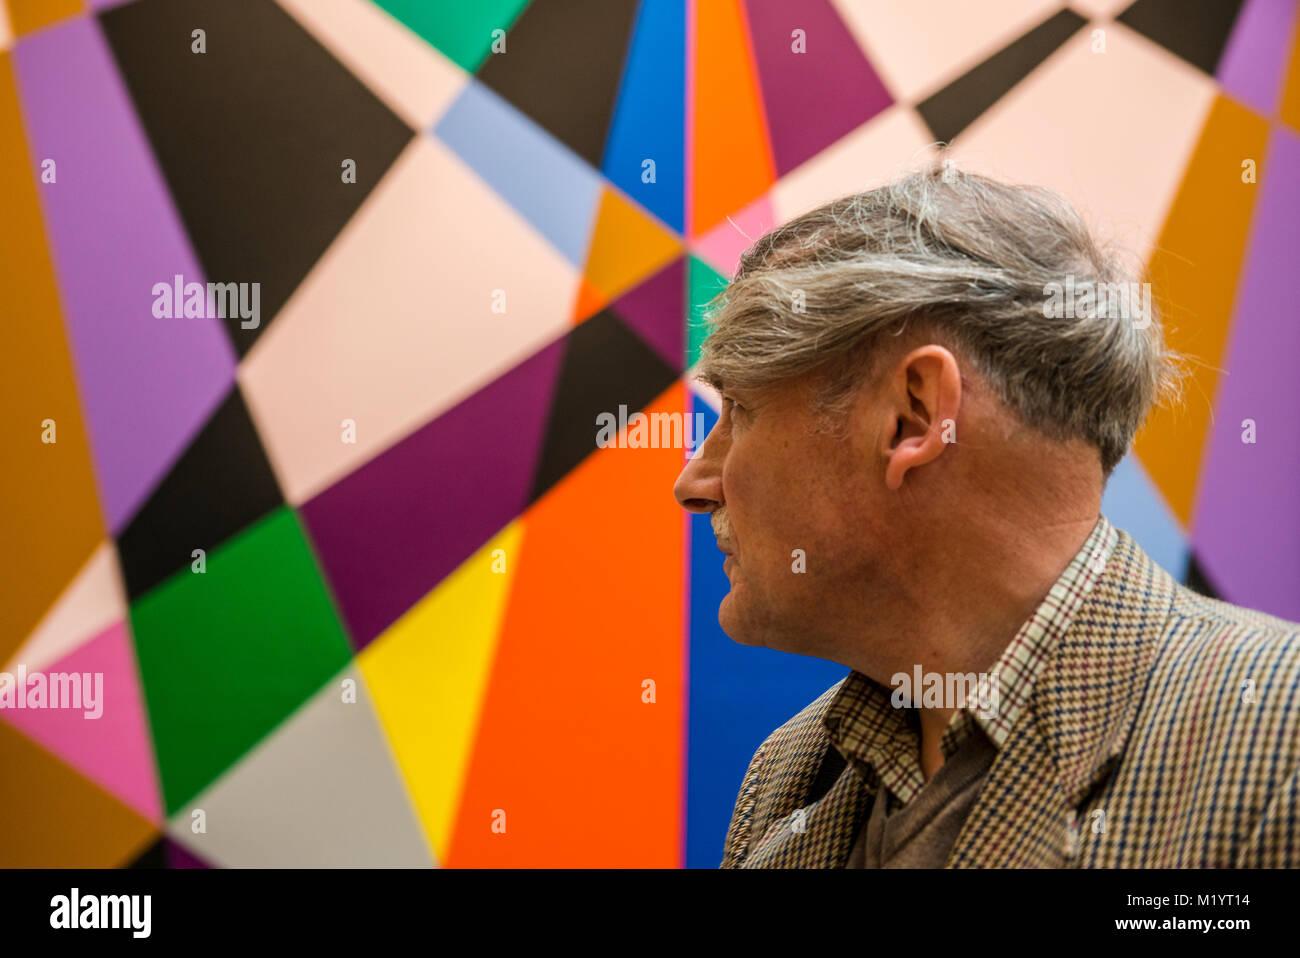 Man looking towards brightly coloured geometric artwork, Leeds Modern Art Gallery, Leeds, England - Stock Image